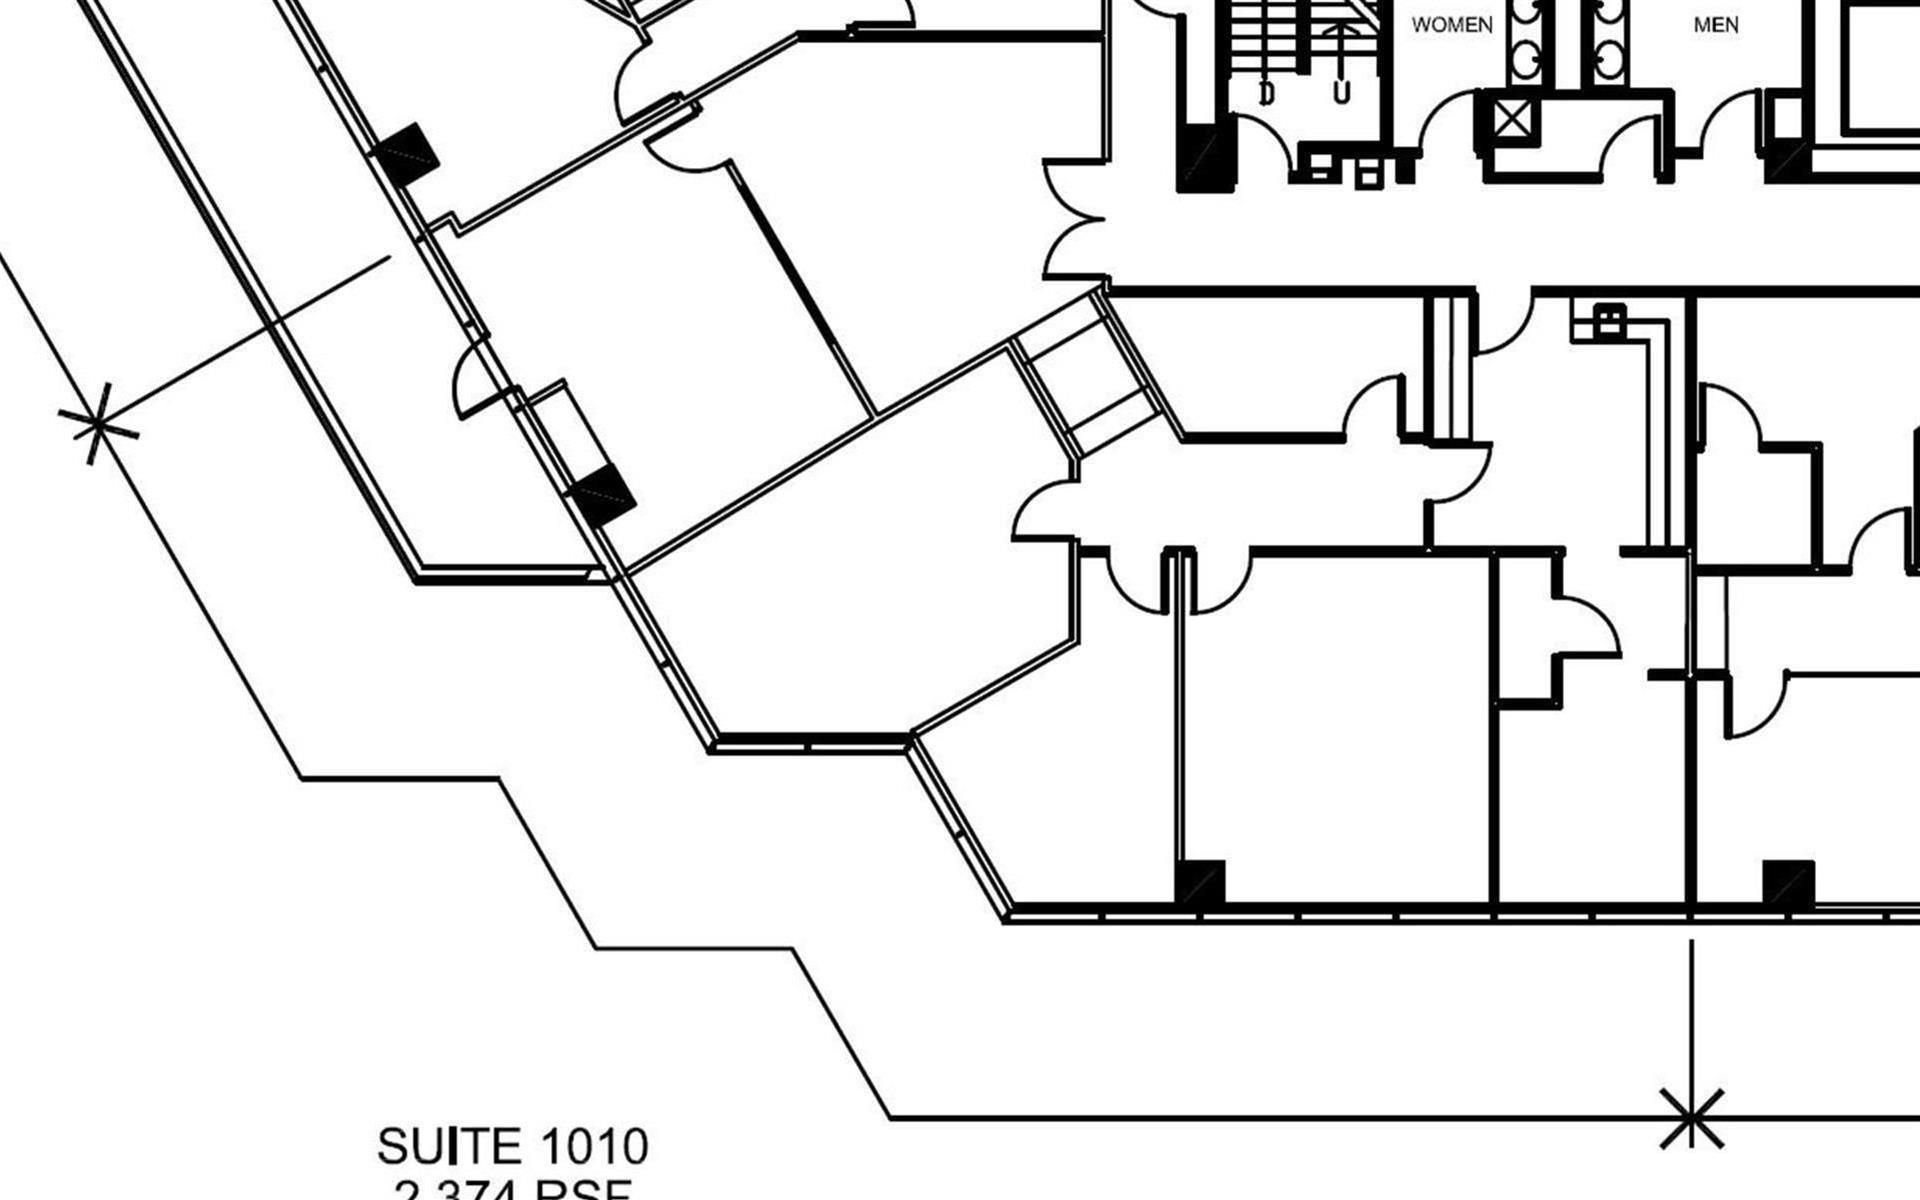 Comerica Bank Building - Office Suite